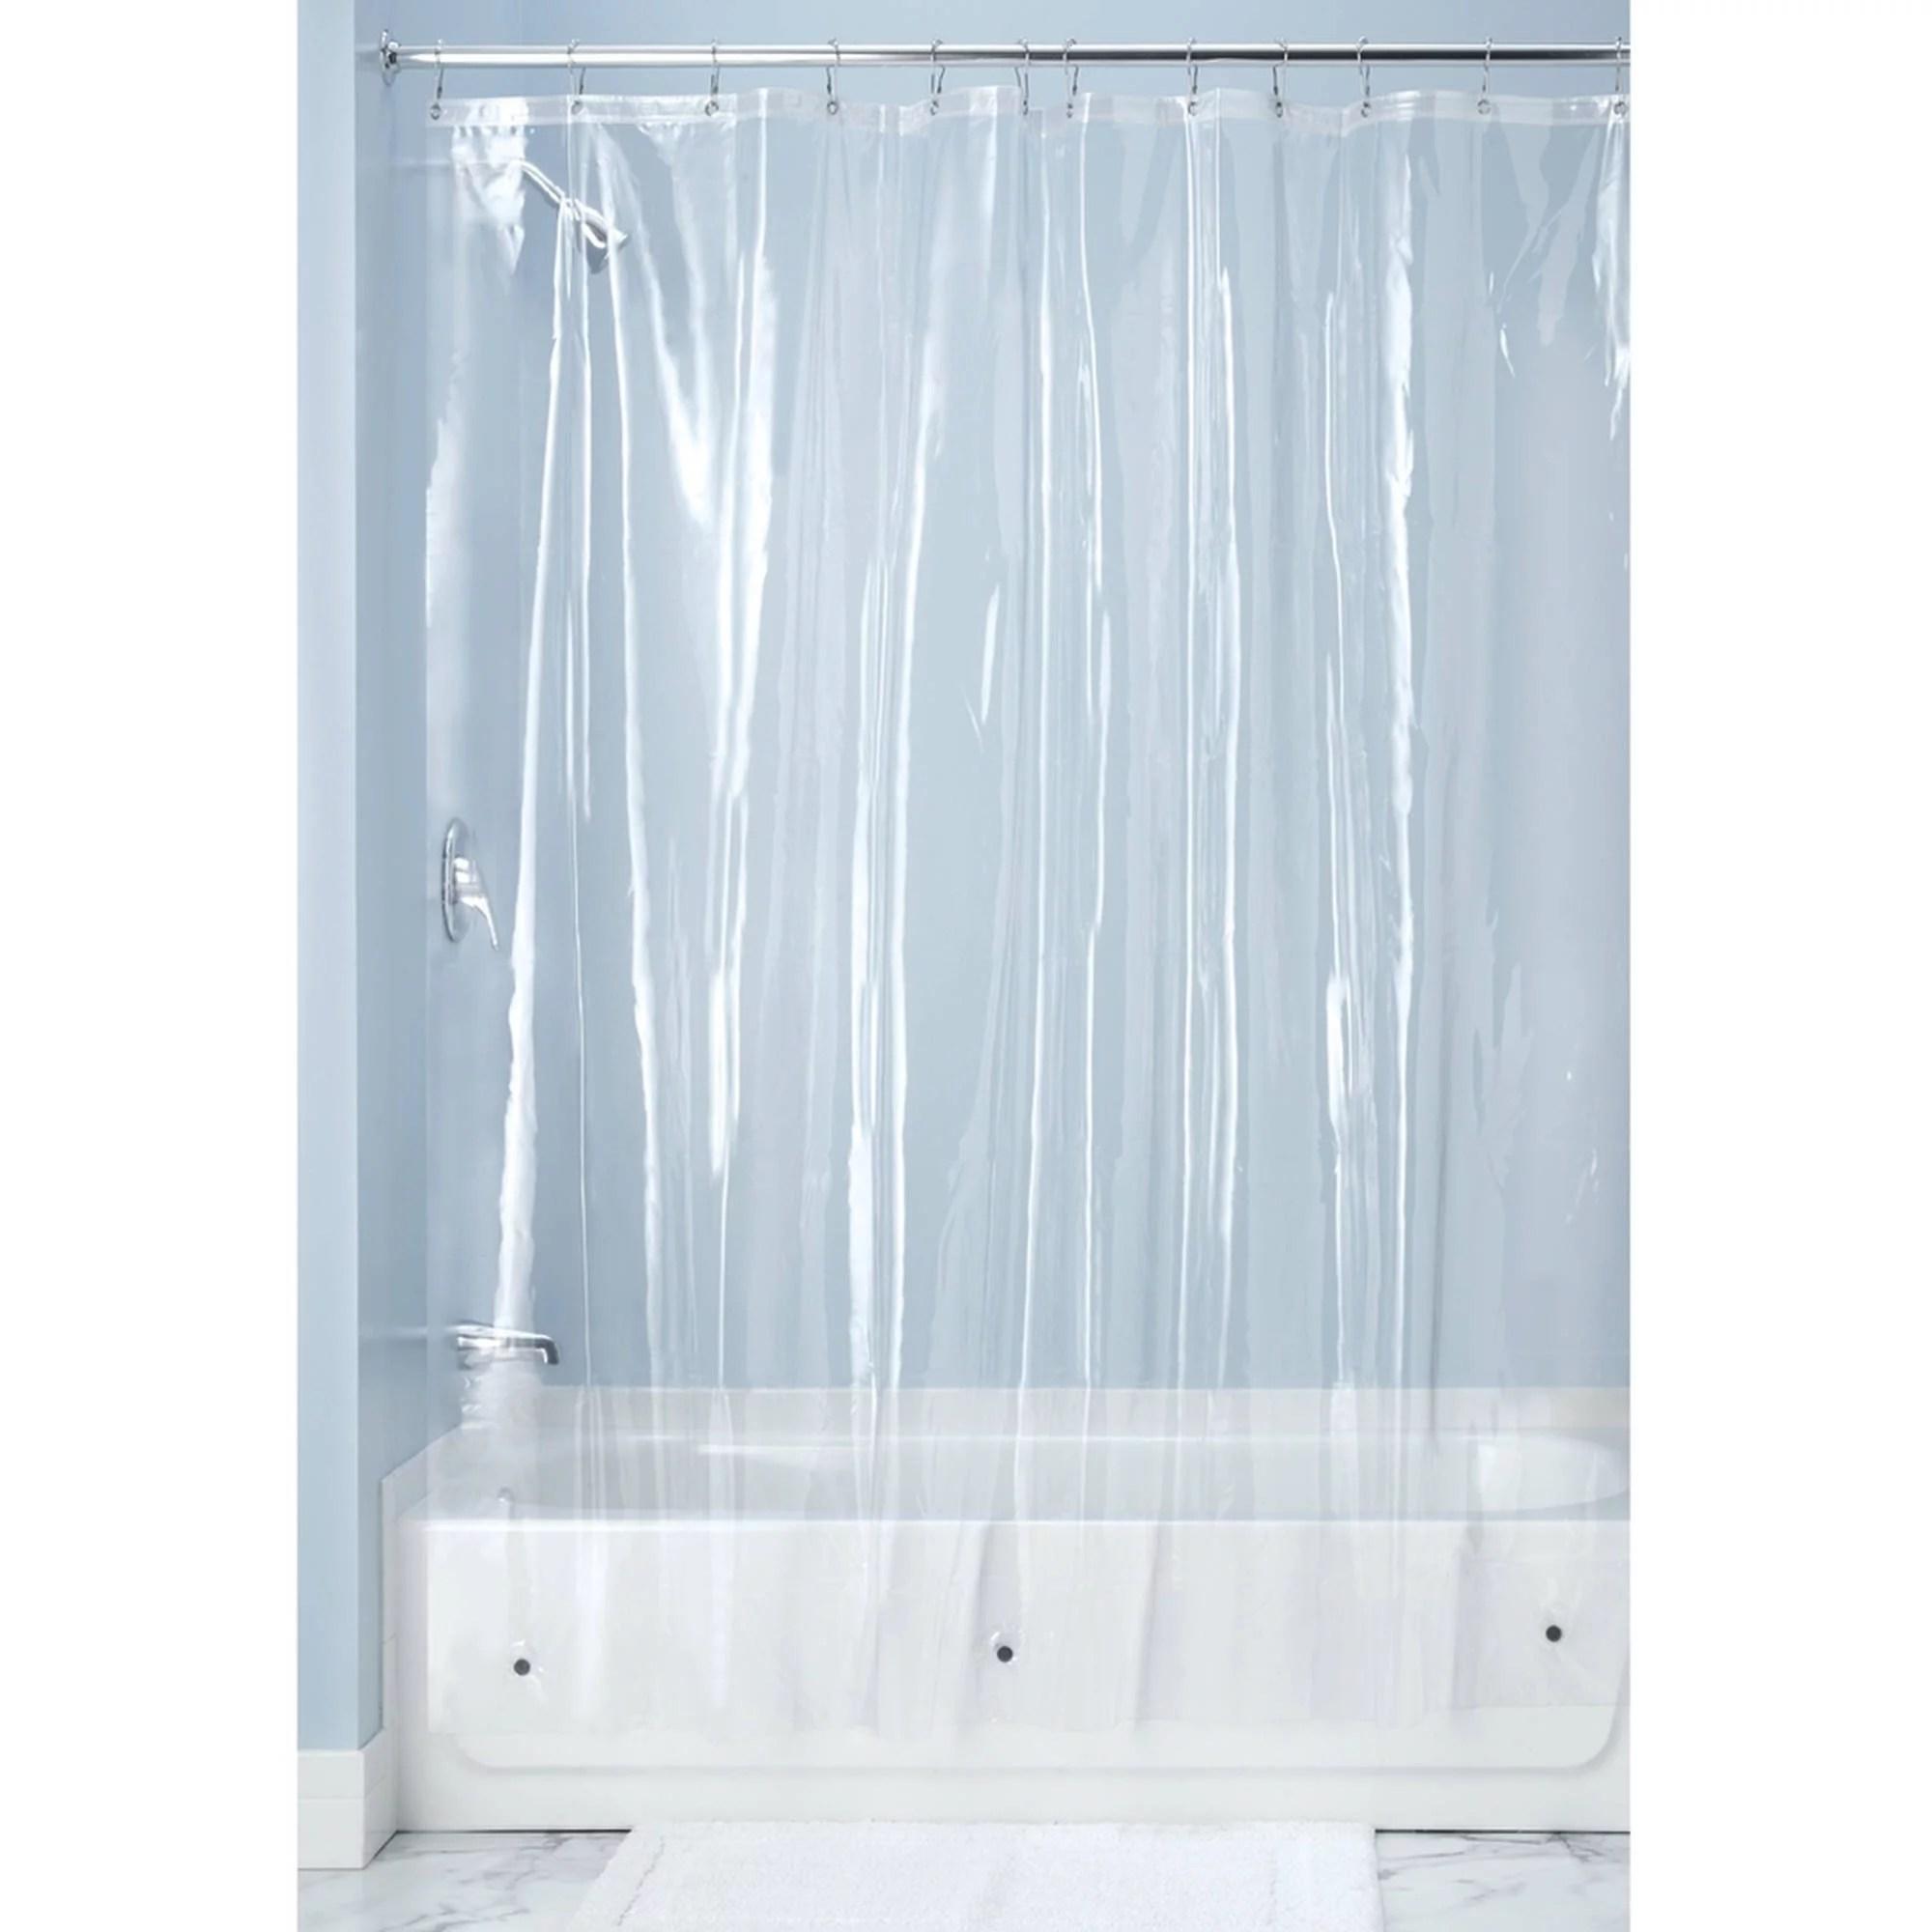 interdesign 10 gauge clear vinyl shower curtain liner 72 x 72 walmart com